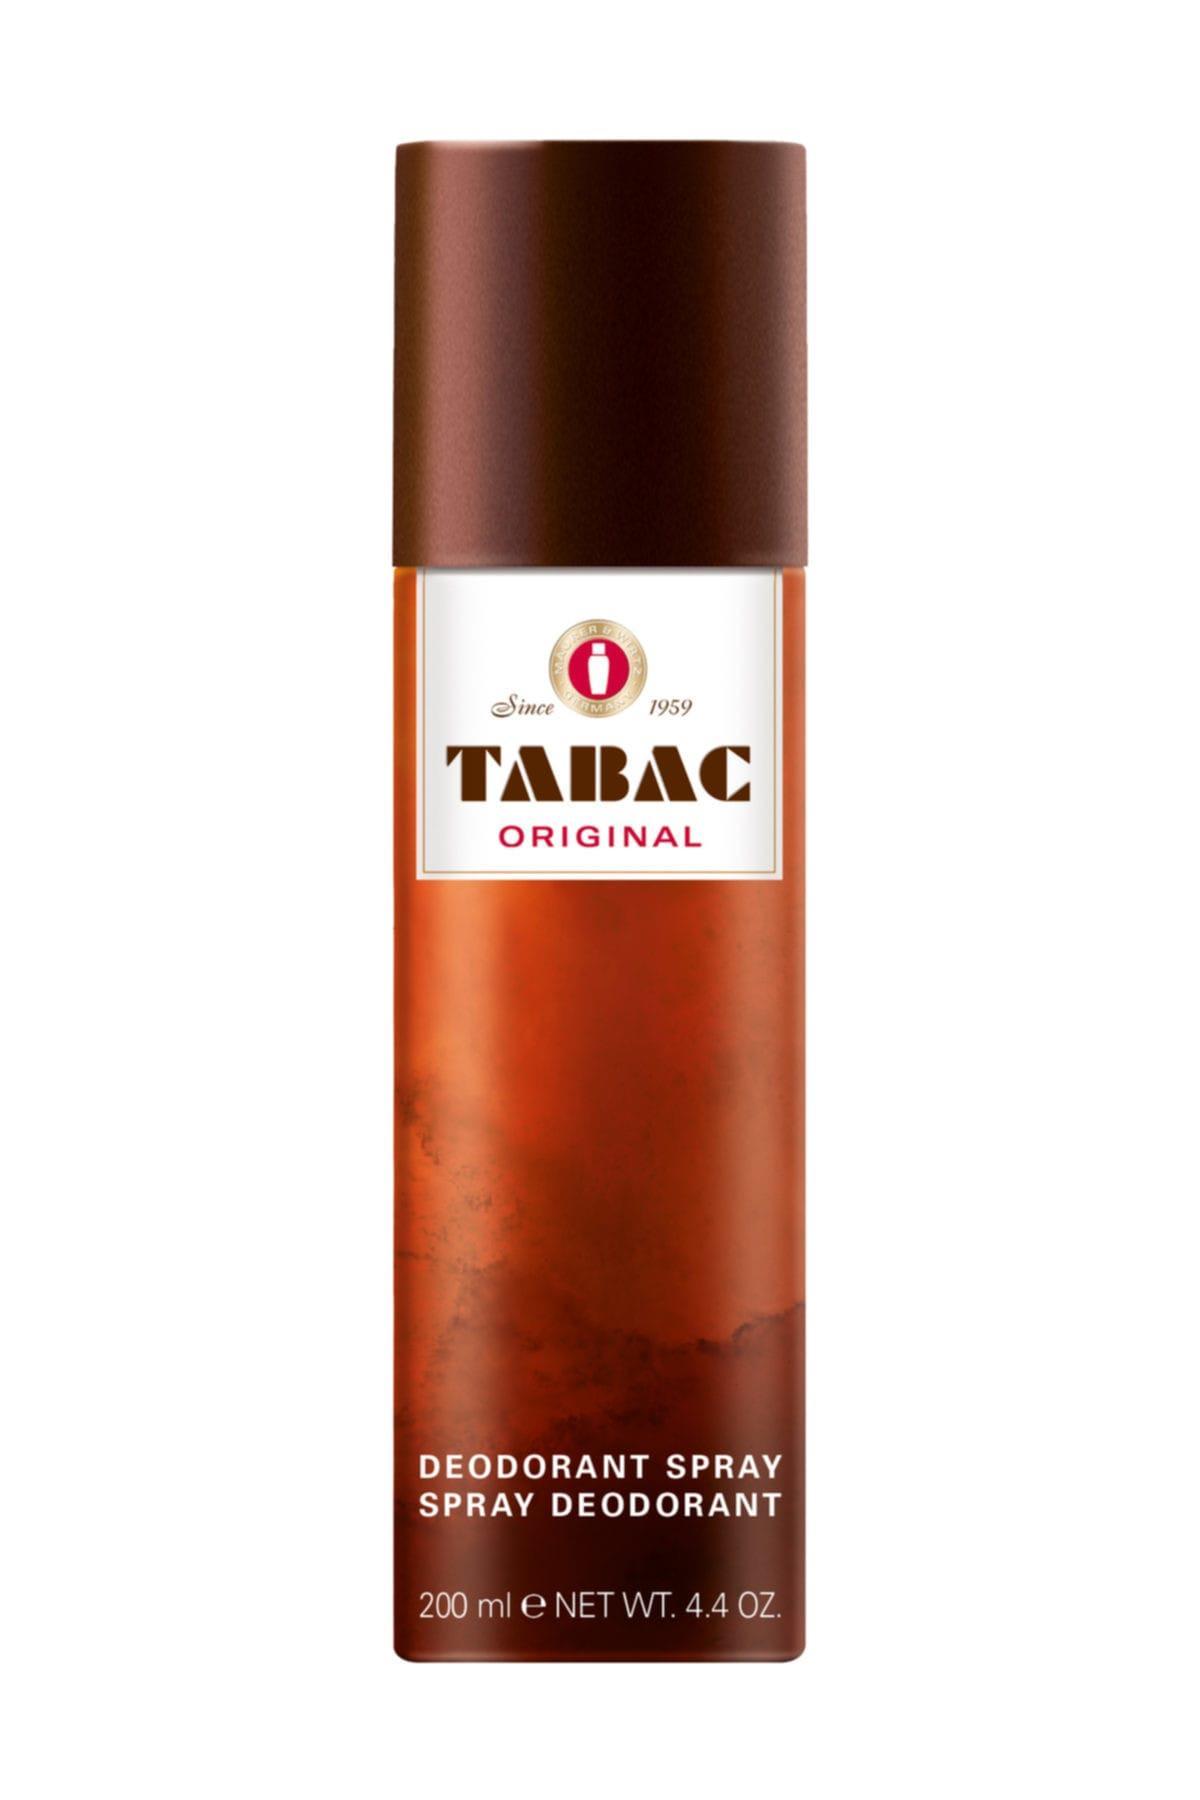 Tabac Spray Deodorant 200 ml